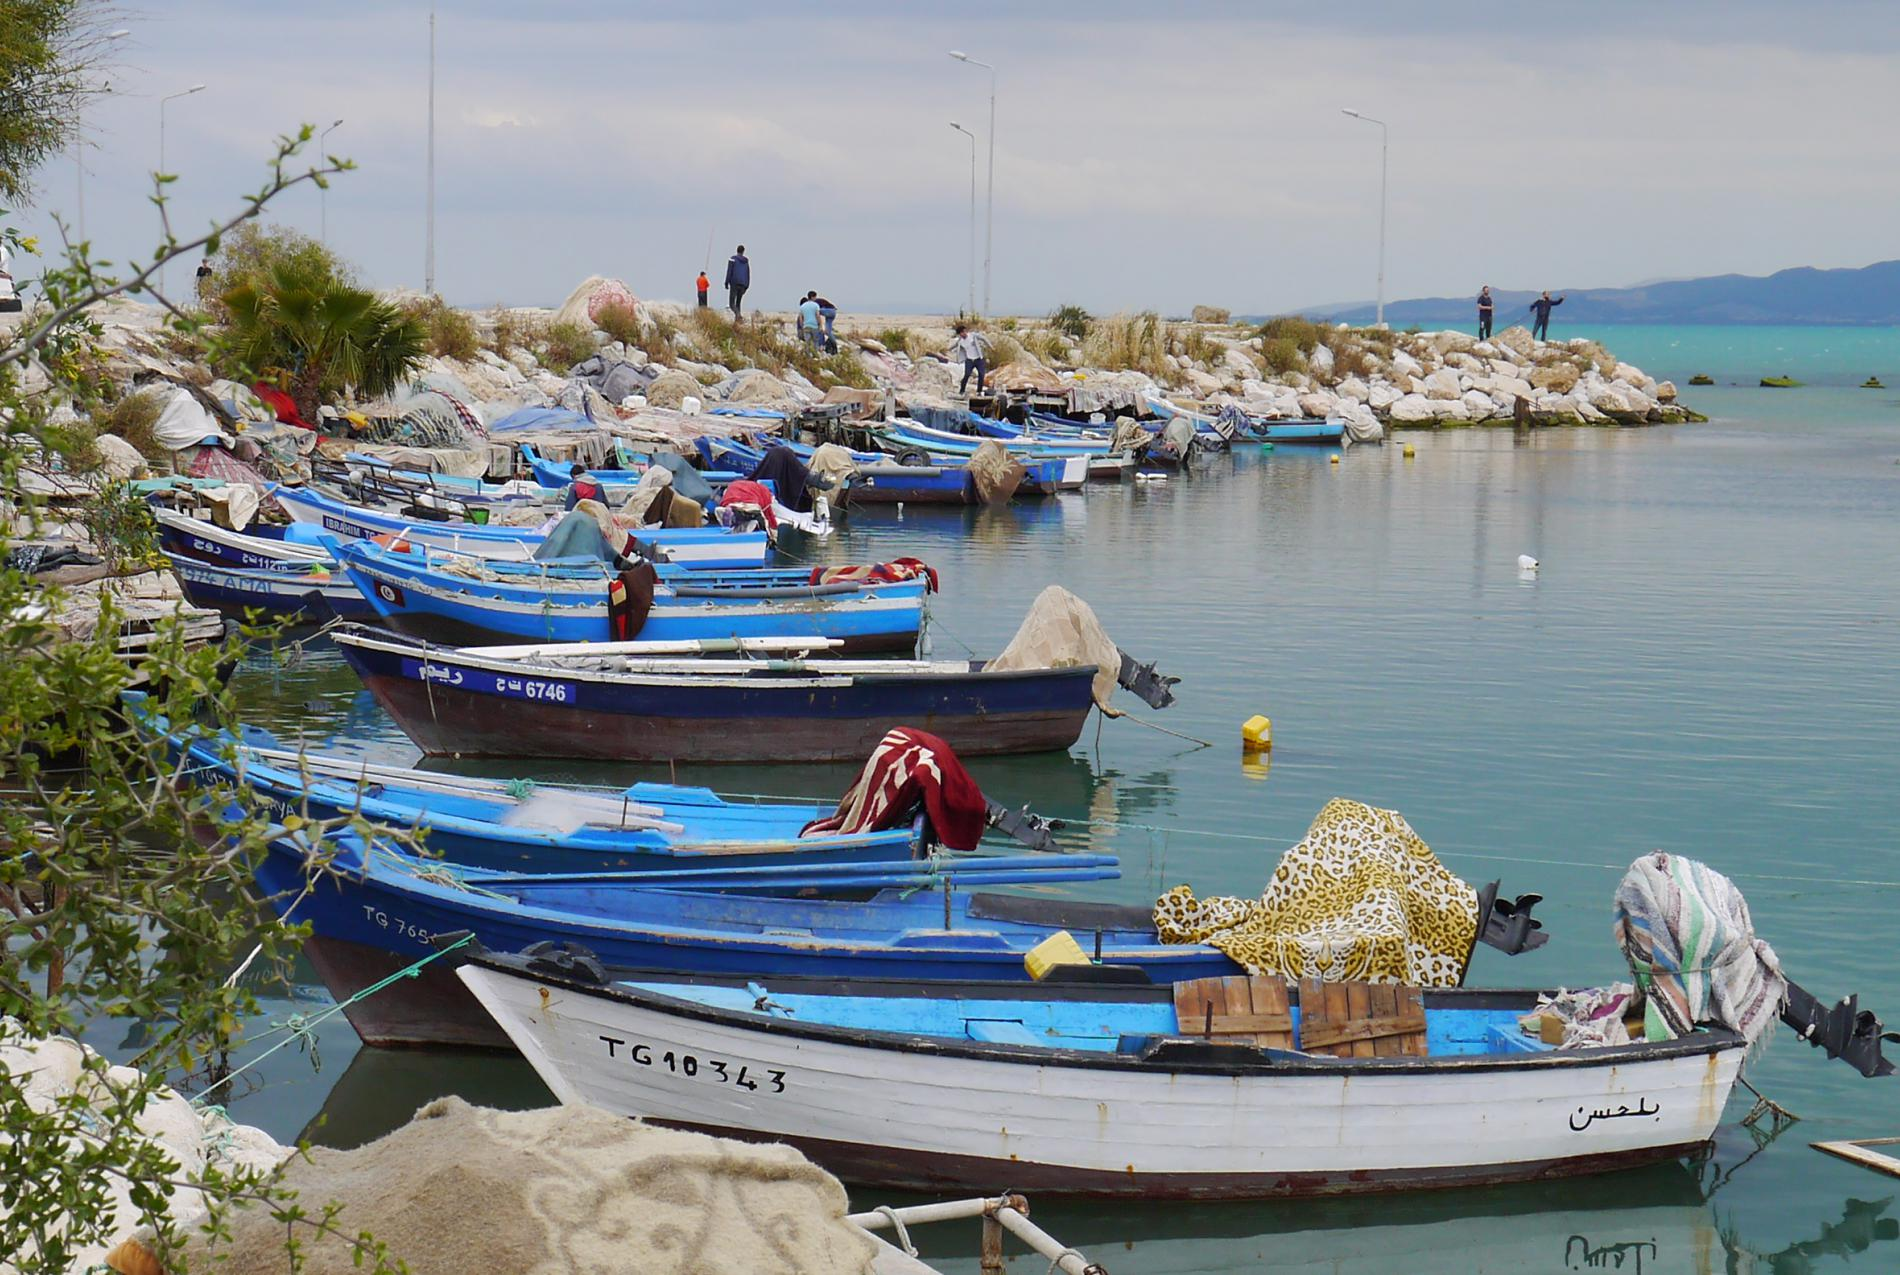 Tunisie : Nos voyages solidaires